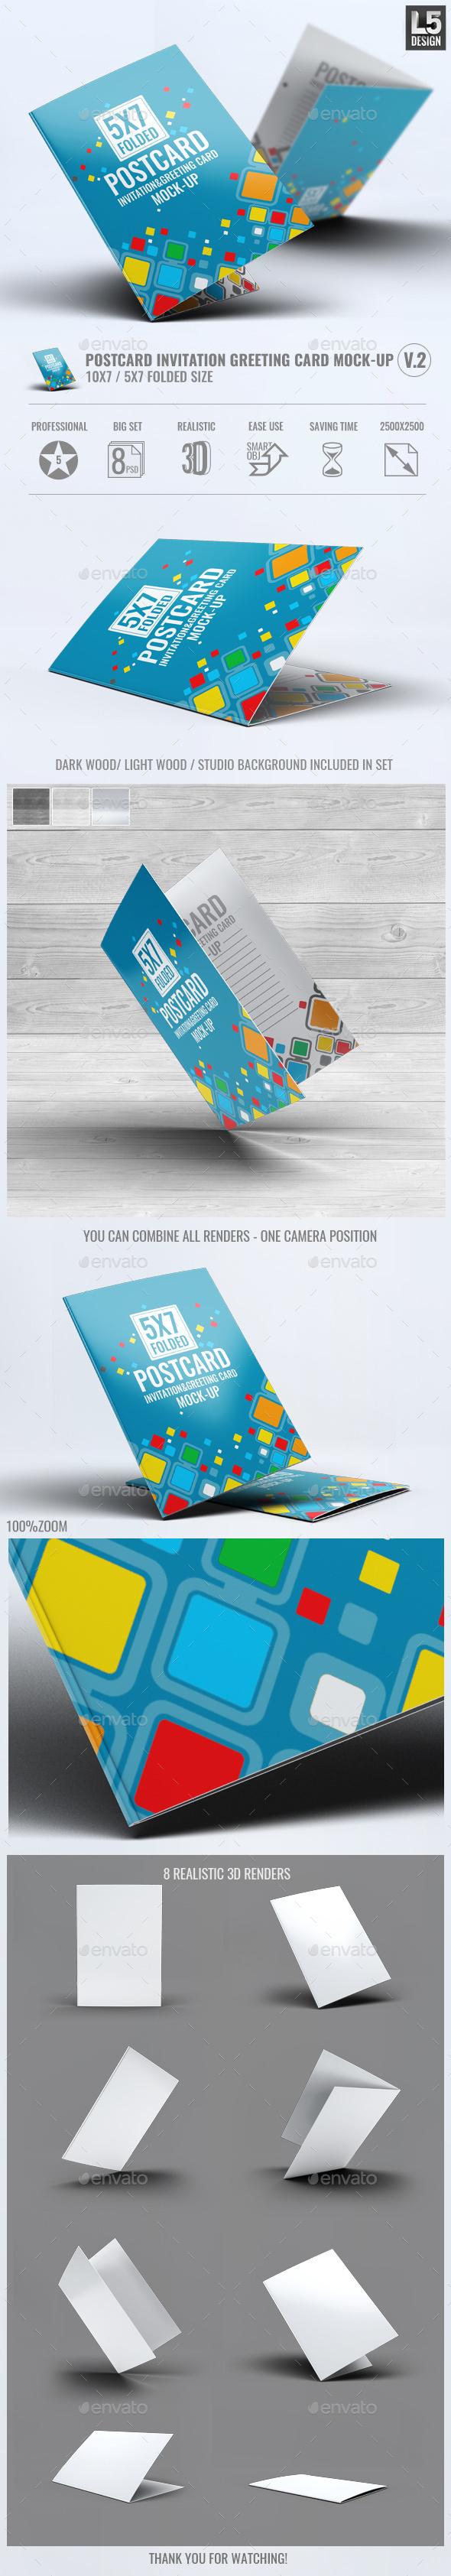 Postcard Invitation Greeting Card Mock-Up V.2 - Miscellaneous Print